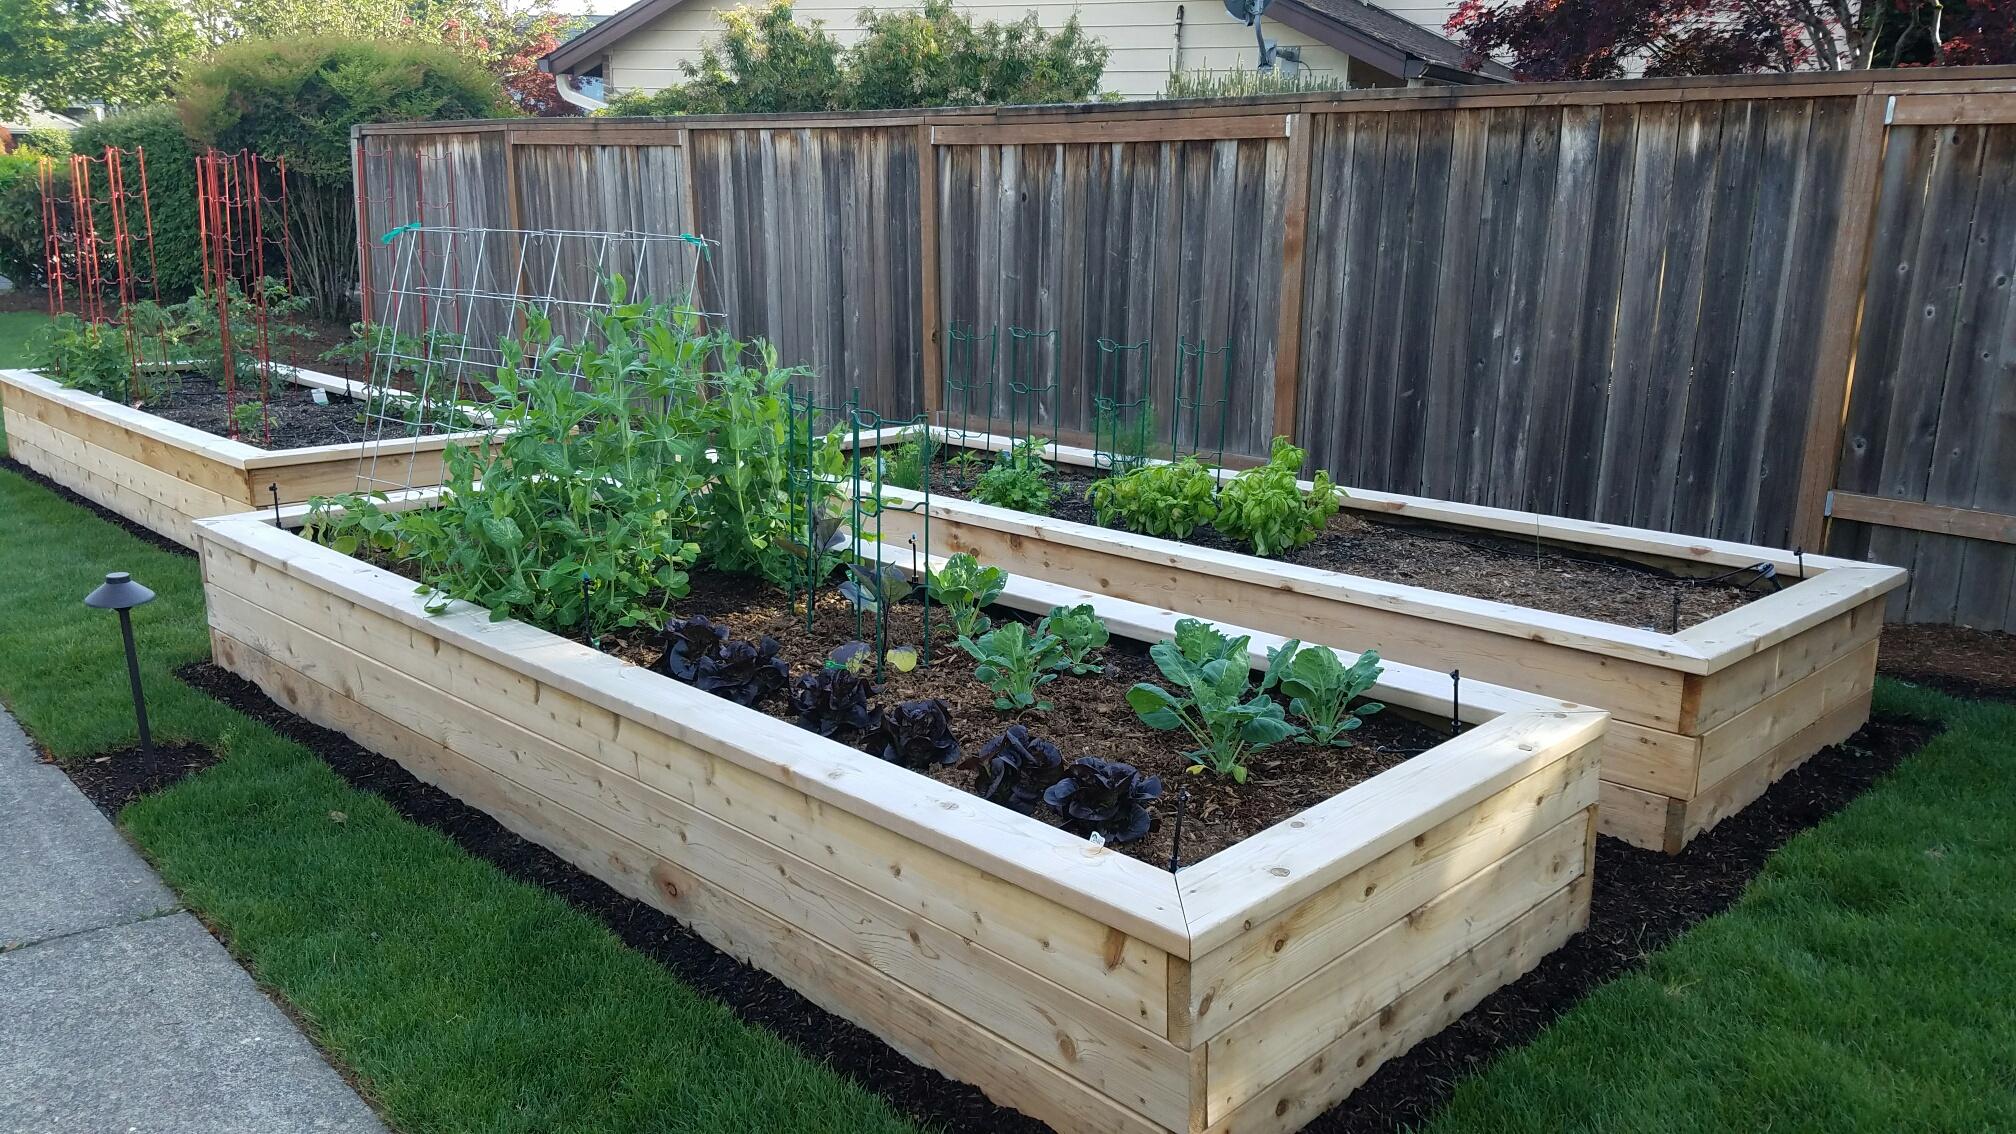 Cedar Raised Beds Garden Box from Installation we did in Beaverton, Oregon